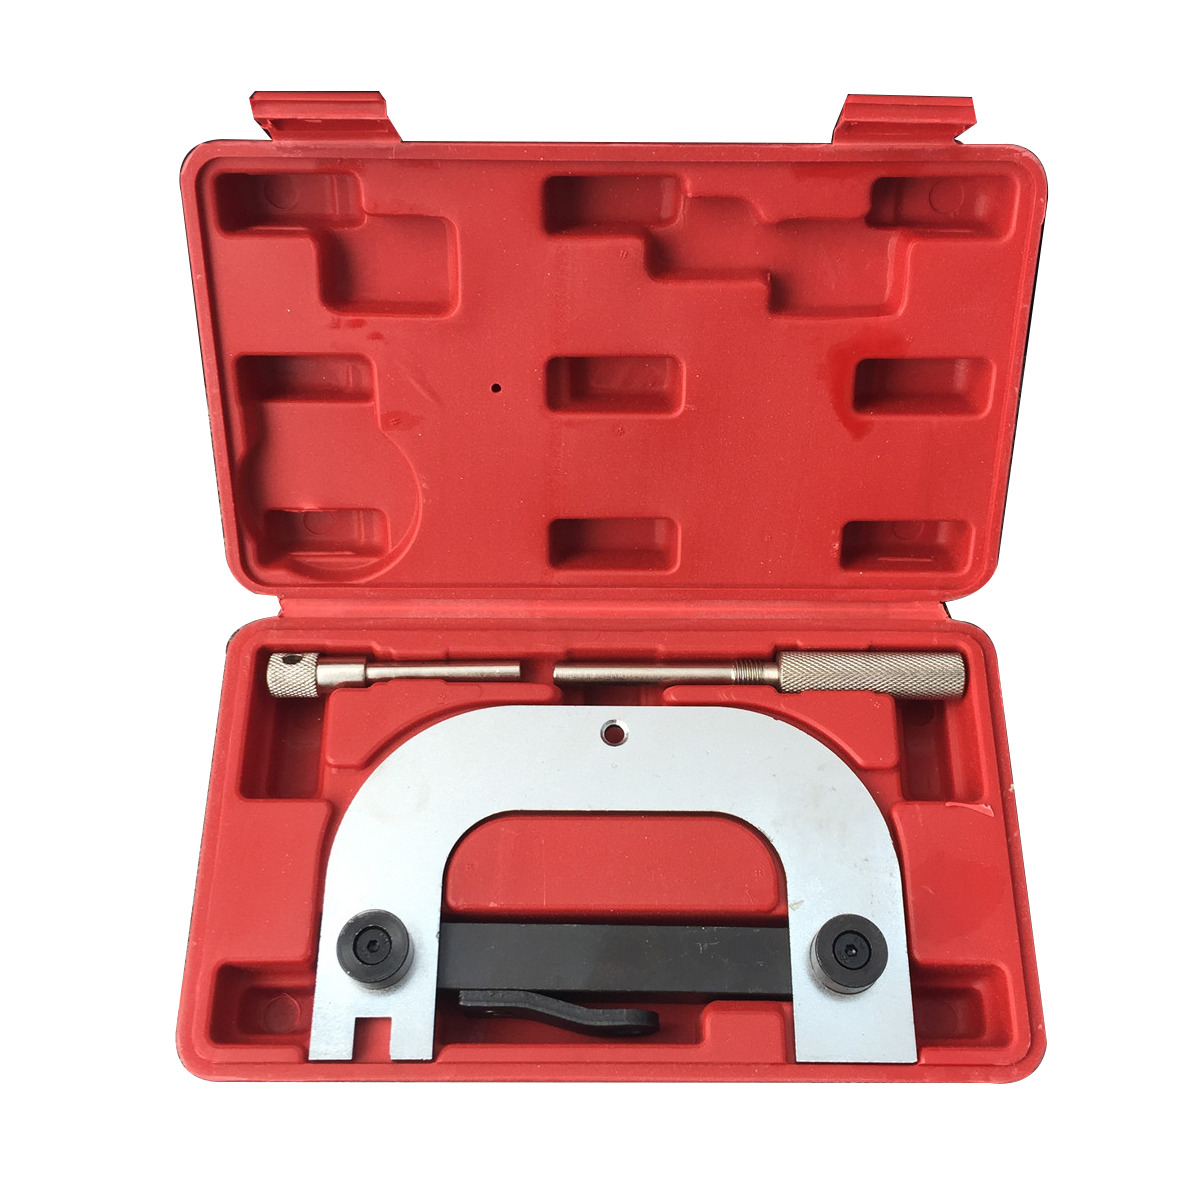 Engine Timing Tool Kit For Renault Vauxhall Petrol Engines 1.4 1.6 1.8 2.0 16v Belt Driven